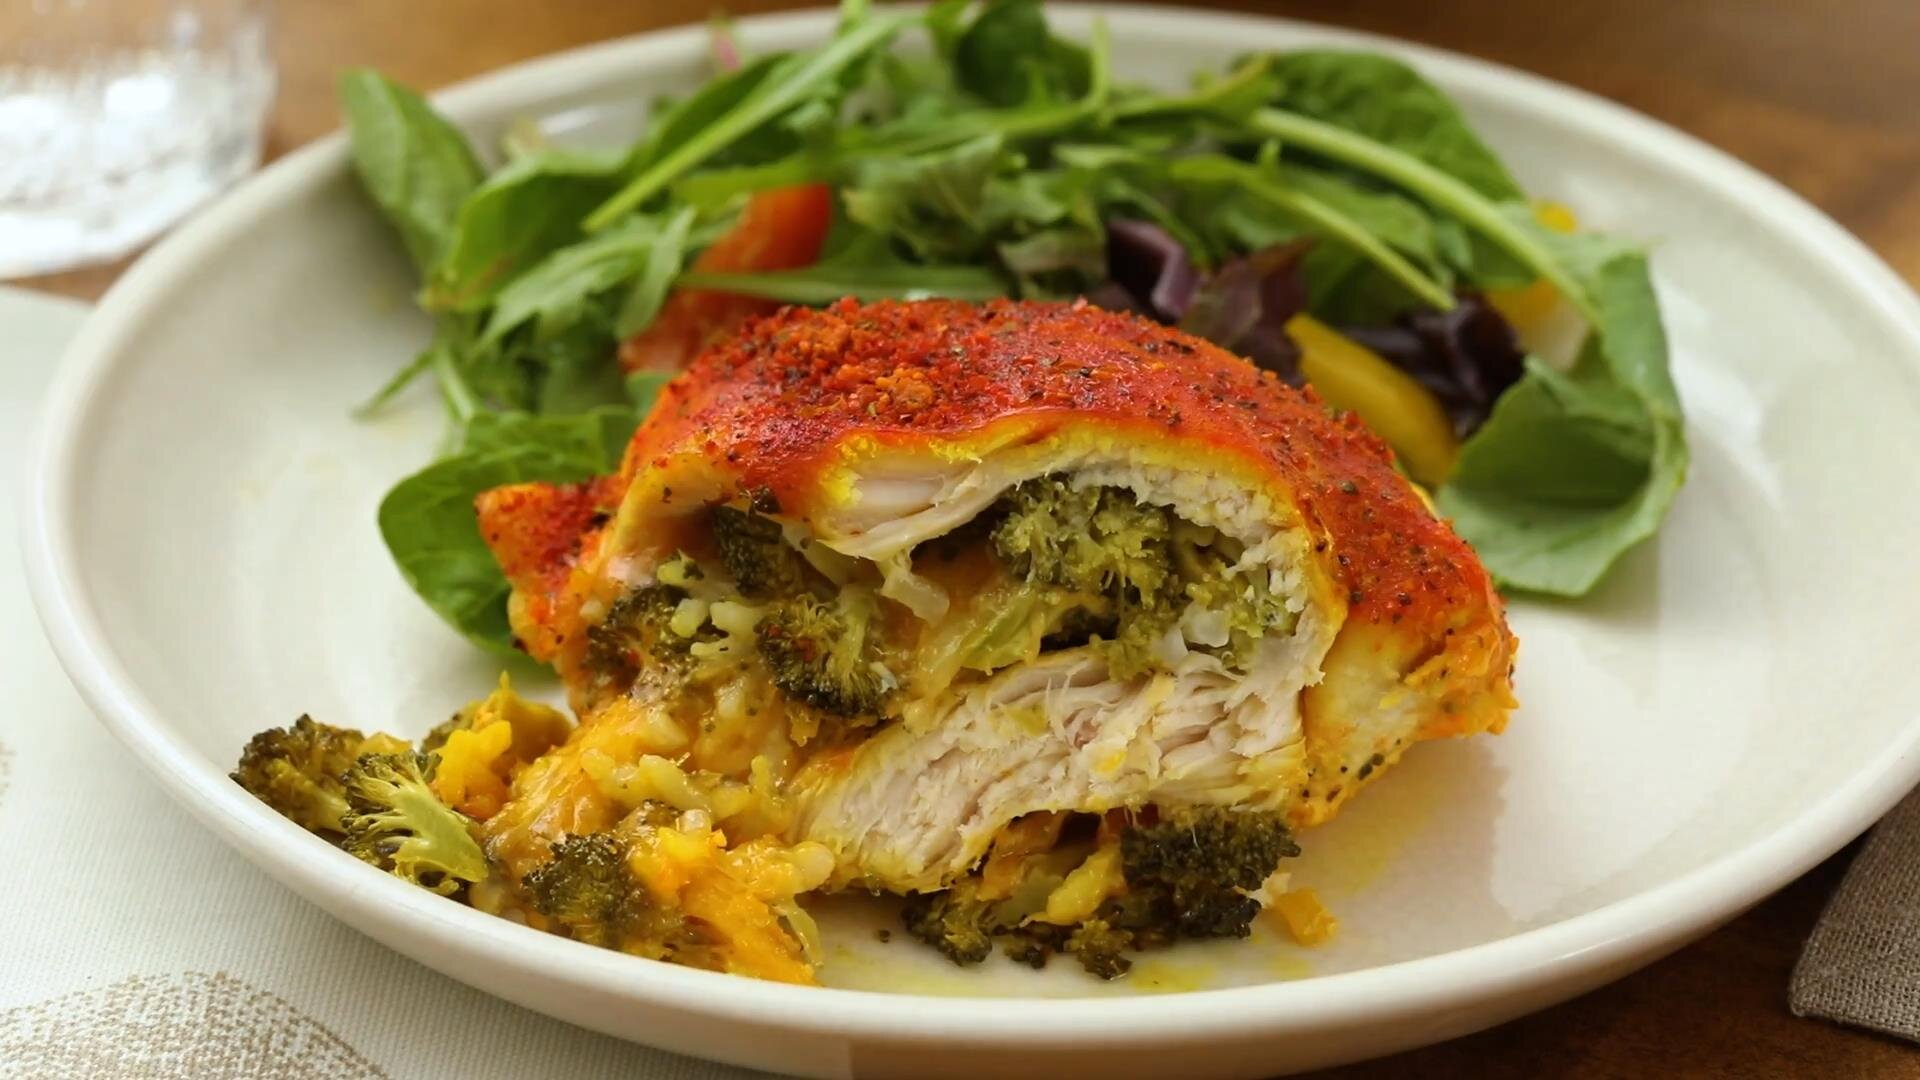 cheesy broccoli stuffed chicken breasts recipe